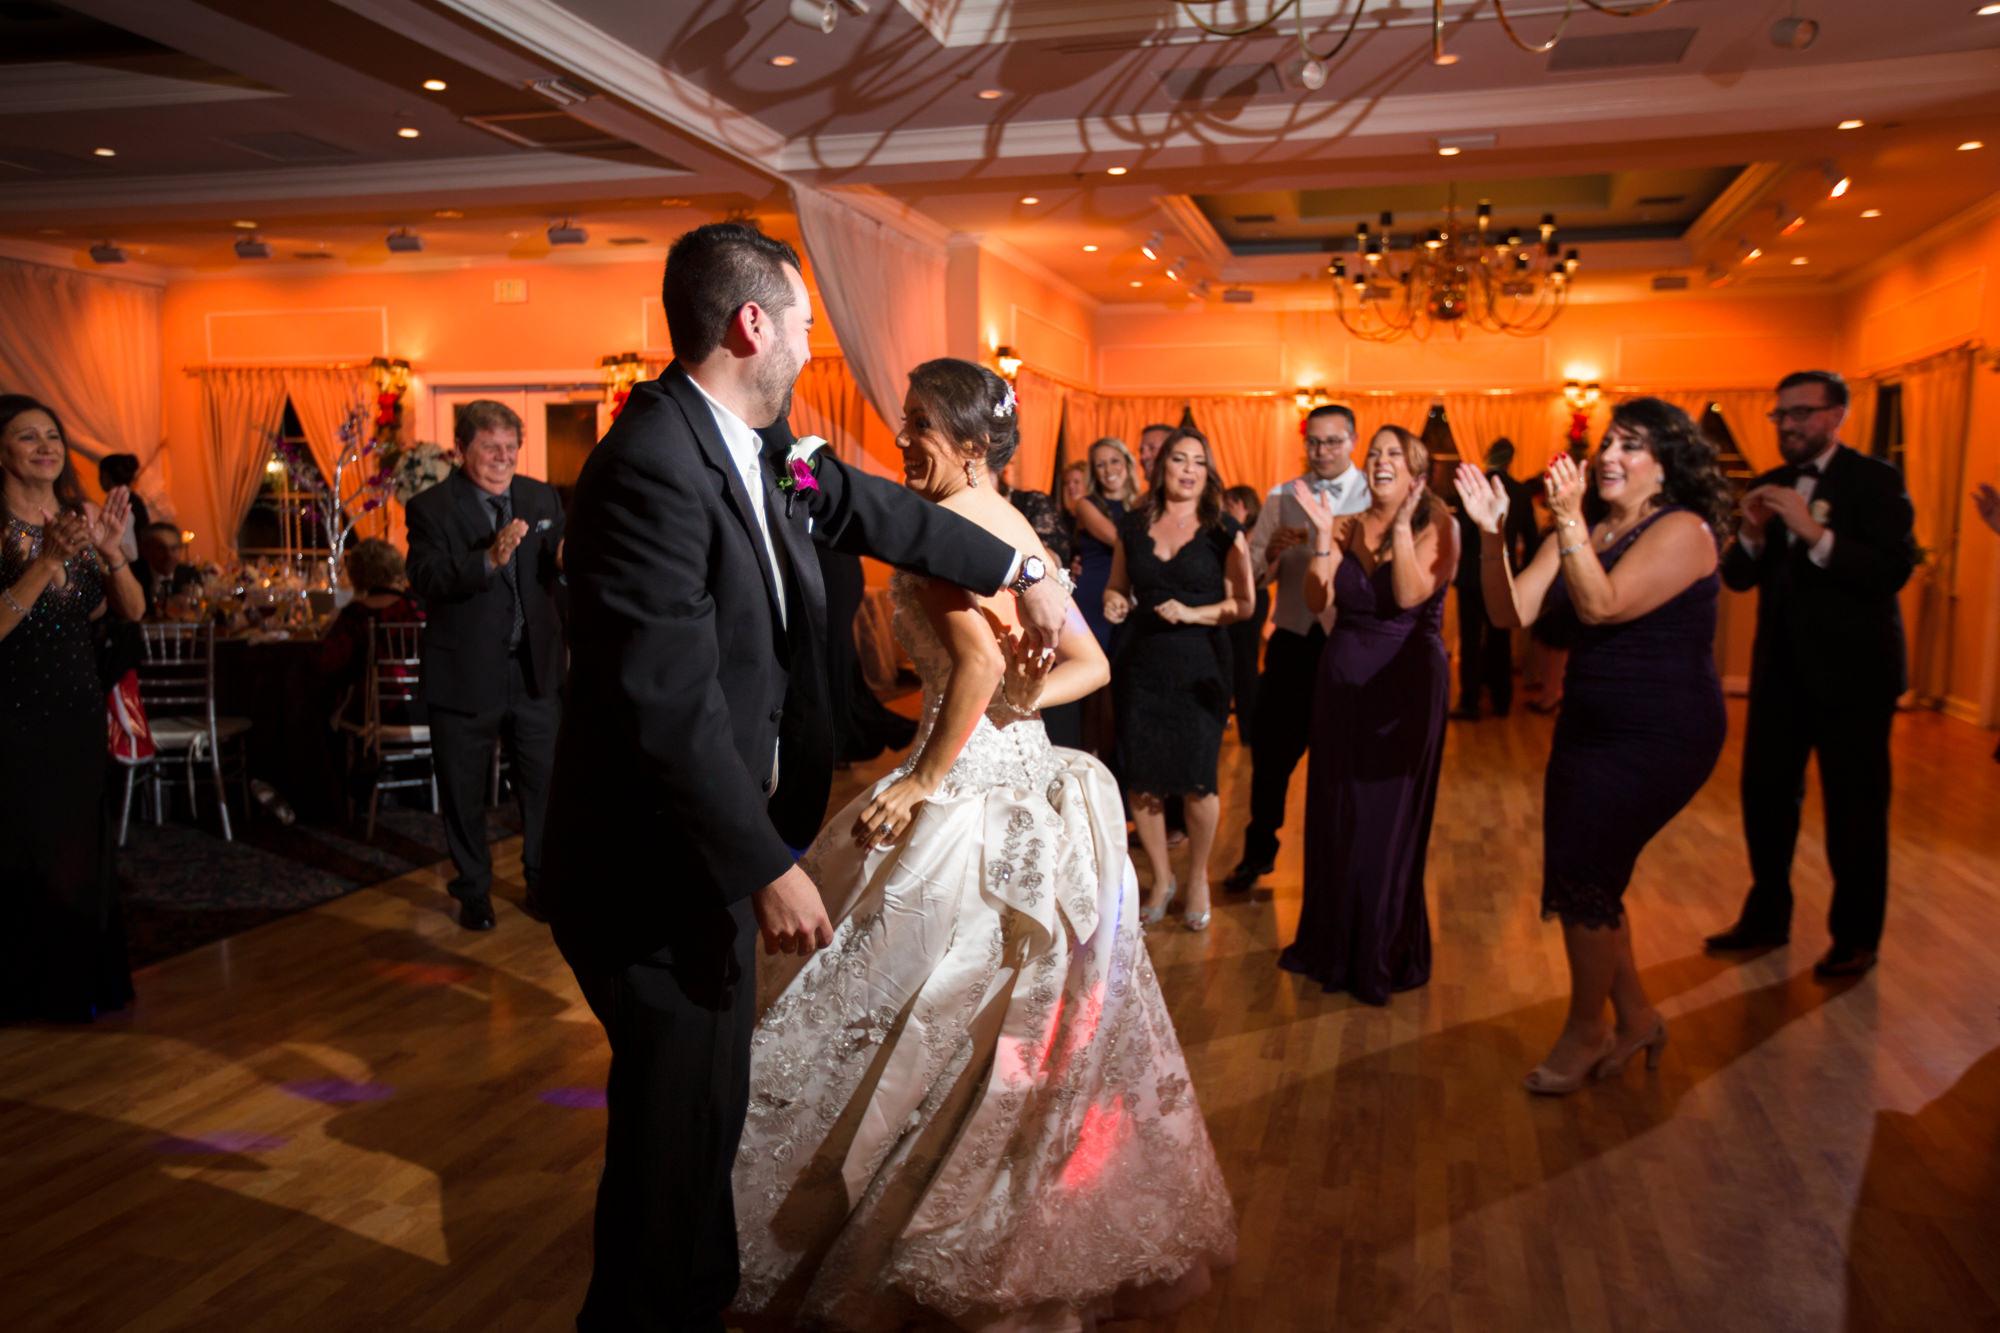 Benvenuto_Wedding_catholic_Florida_Bride-Groom-128.jpg